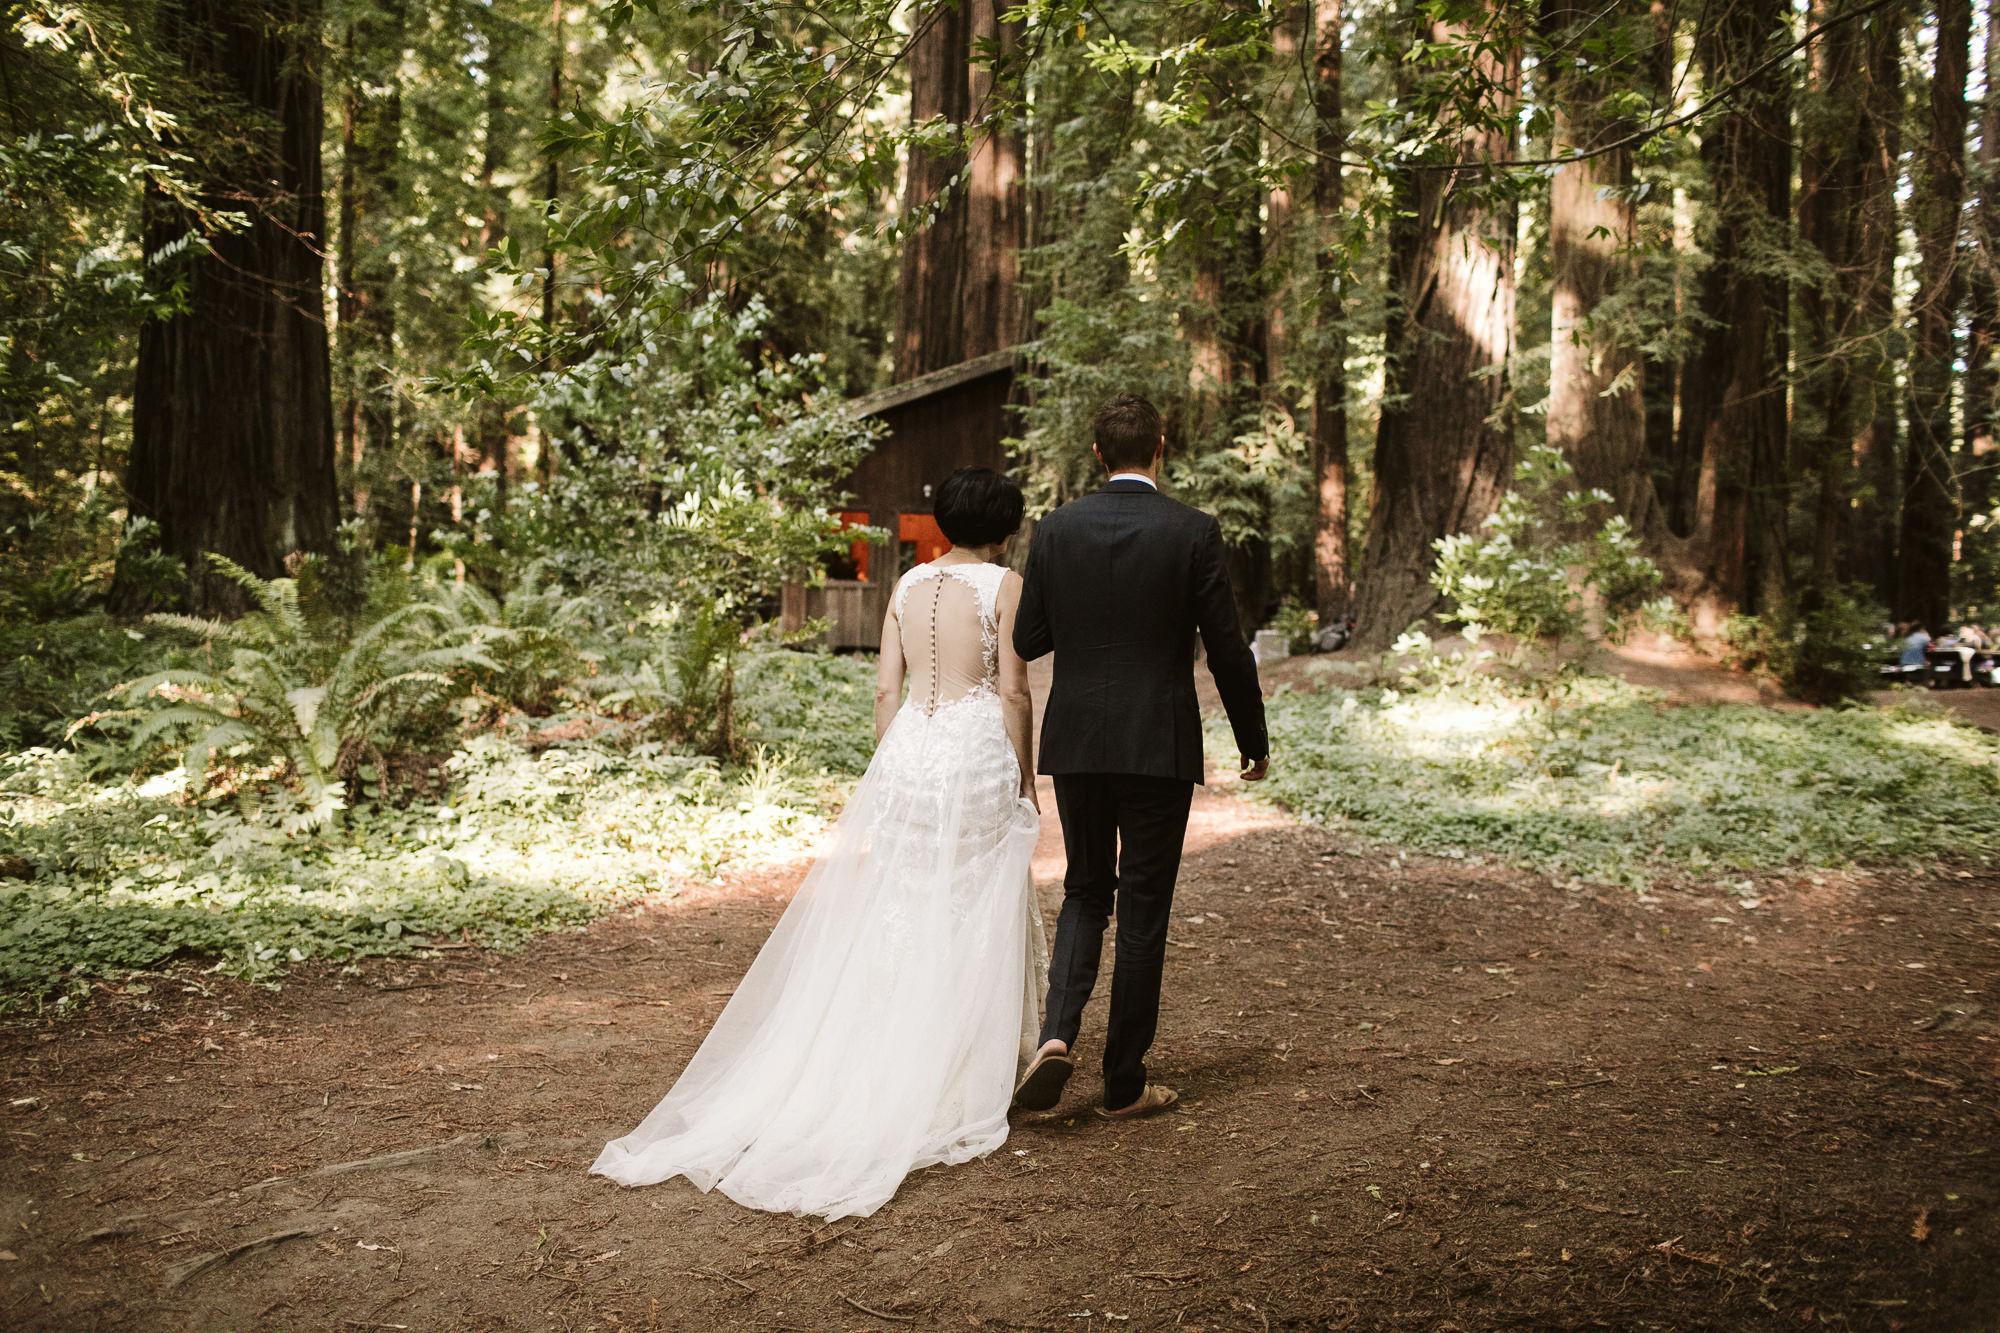 California-wedding-photographer-alfonso-flores-pamplin-groove-293.jpg